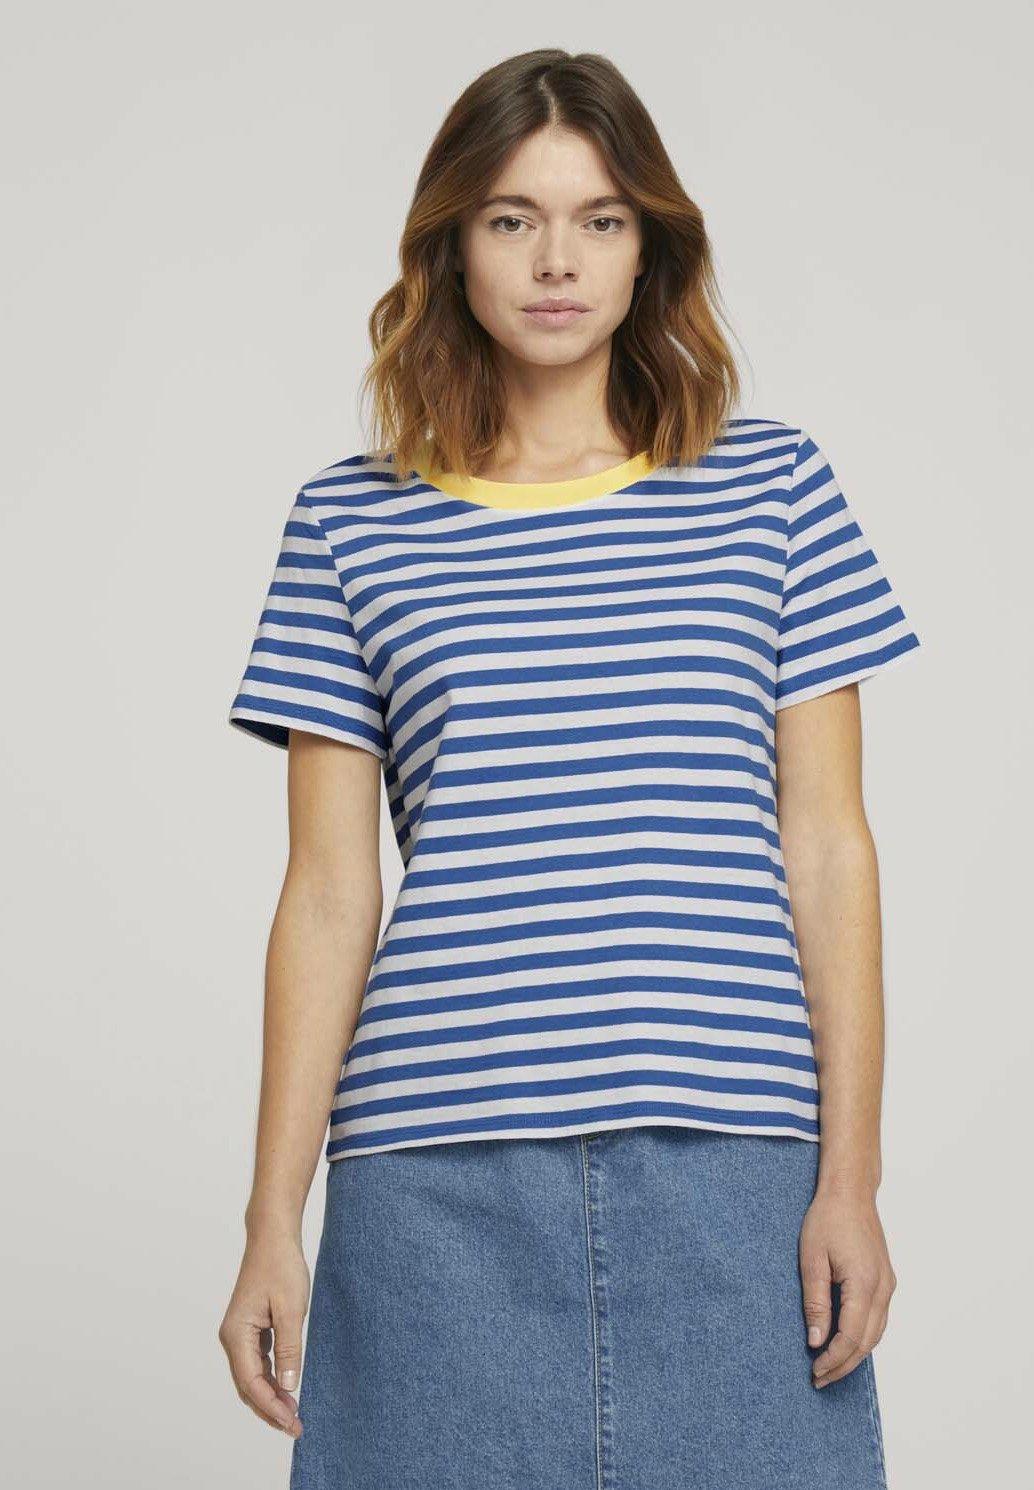 Women RELAXED STRIPE TEE - Print T-shirt - blue/white